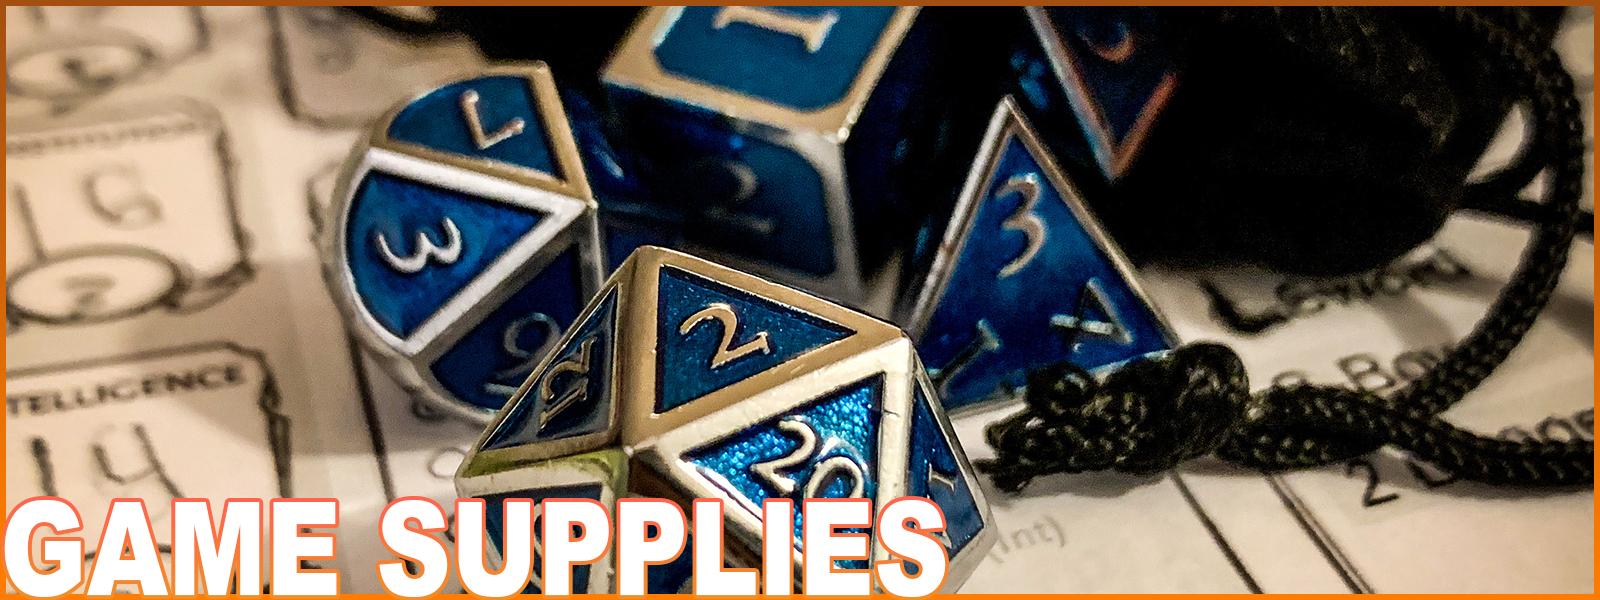 game-supplies-banner.jpg